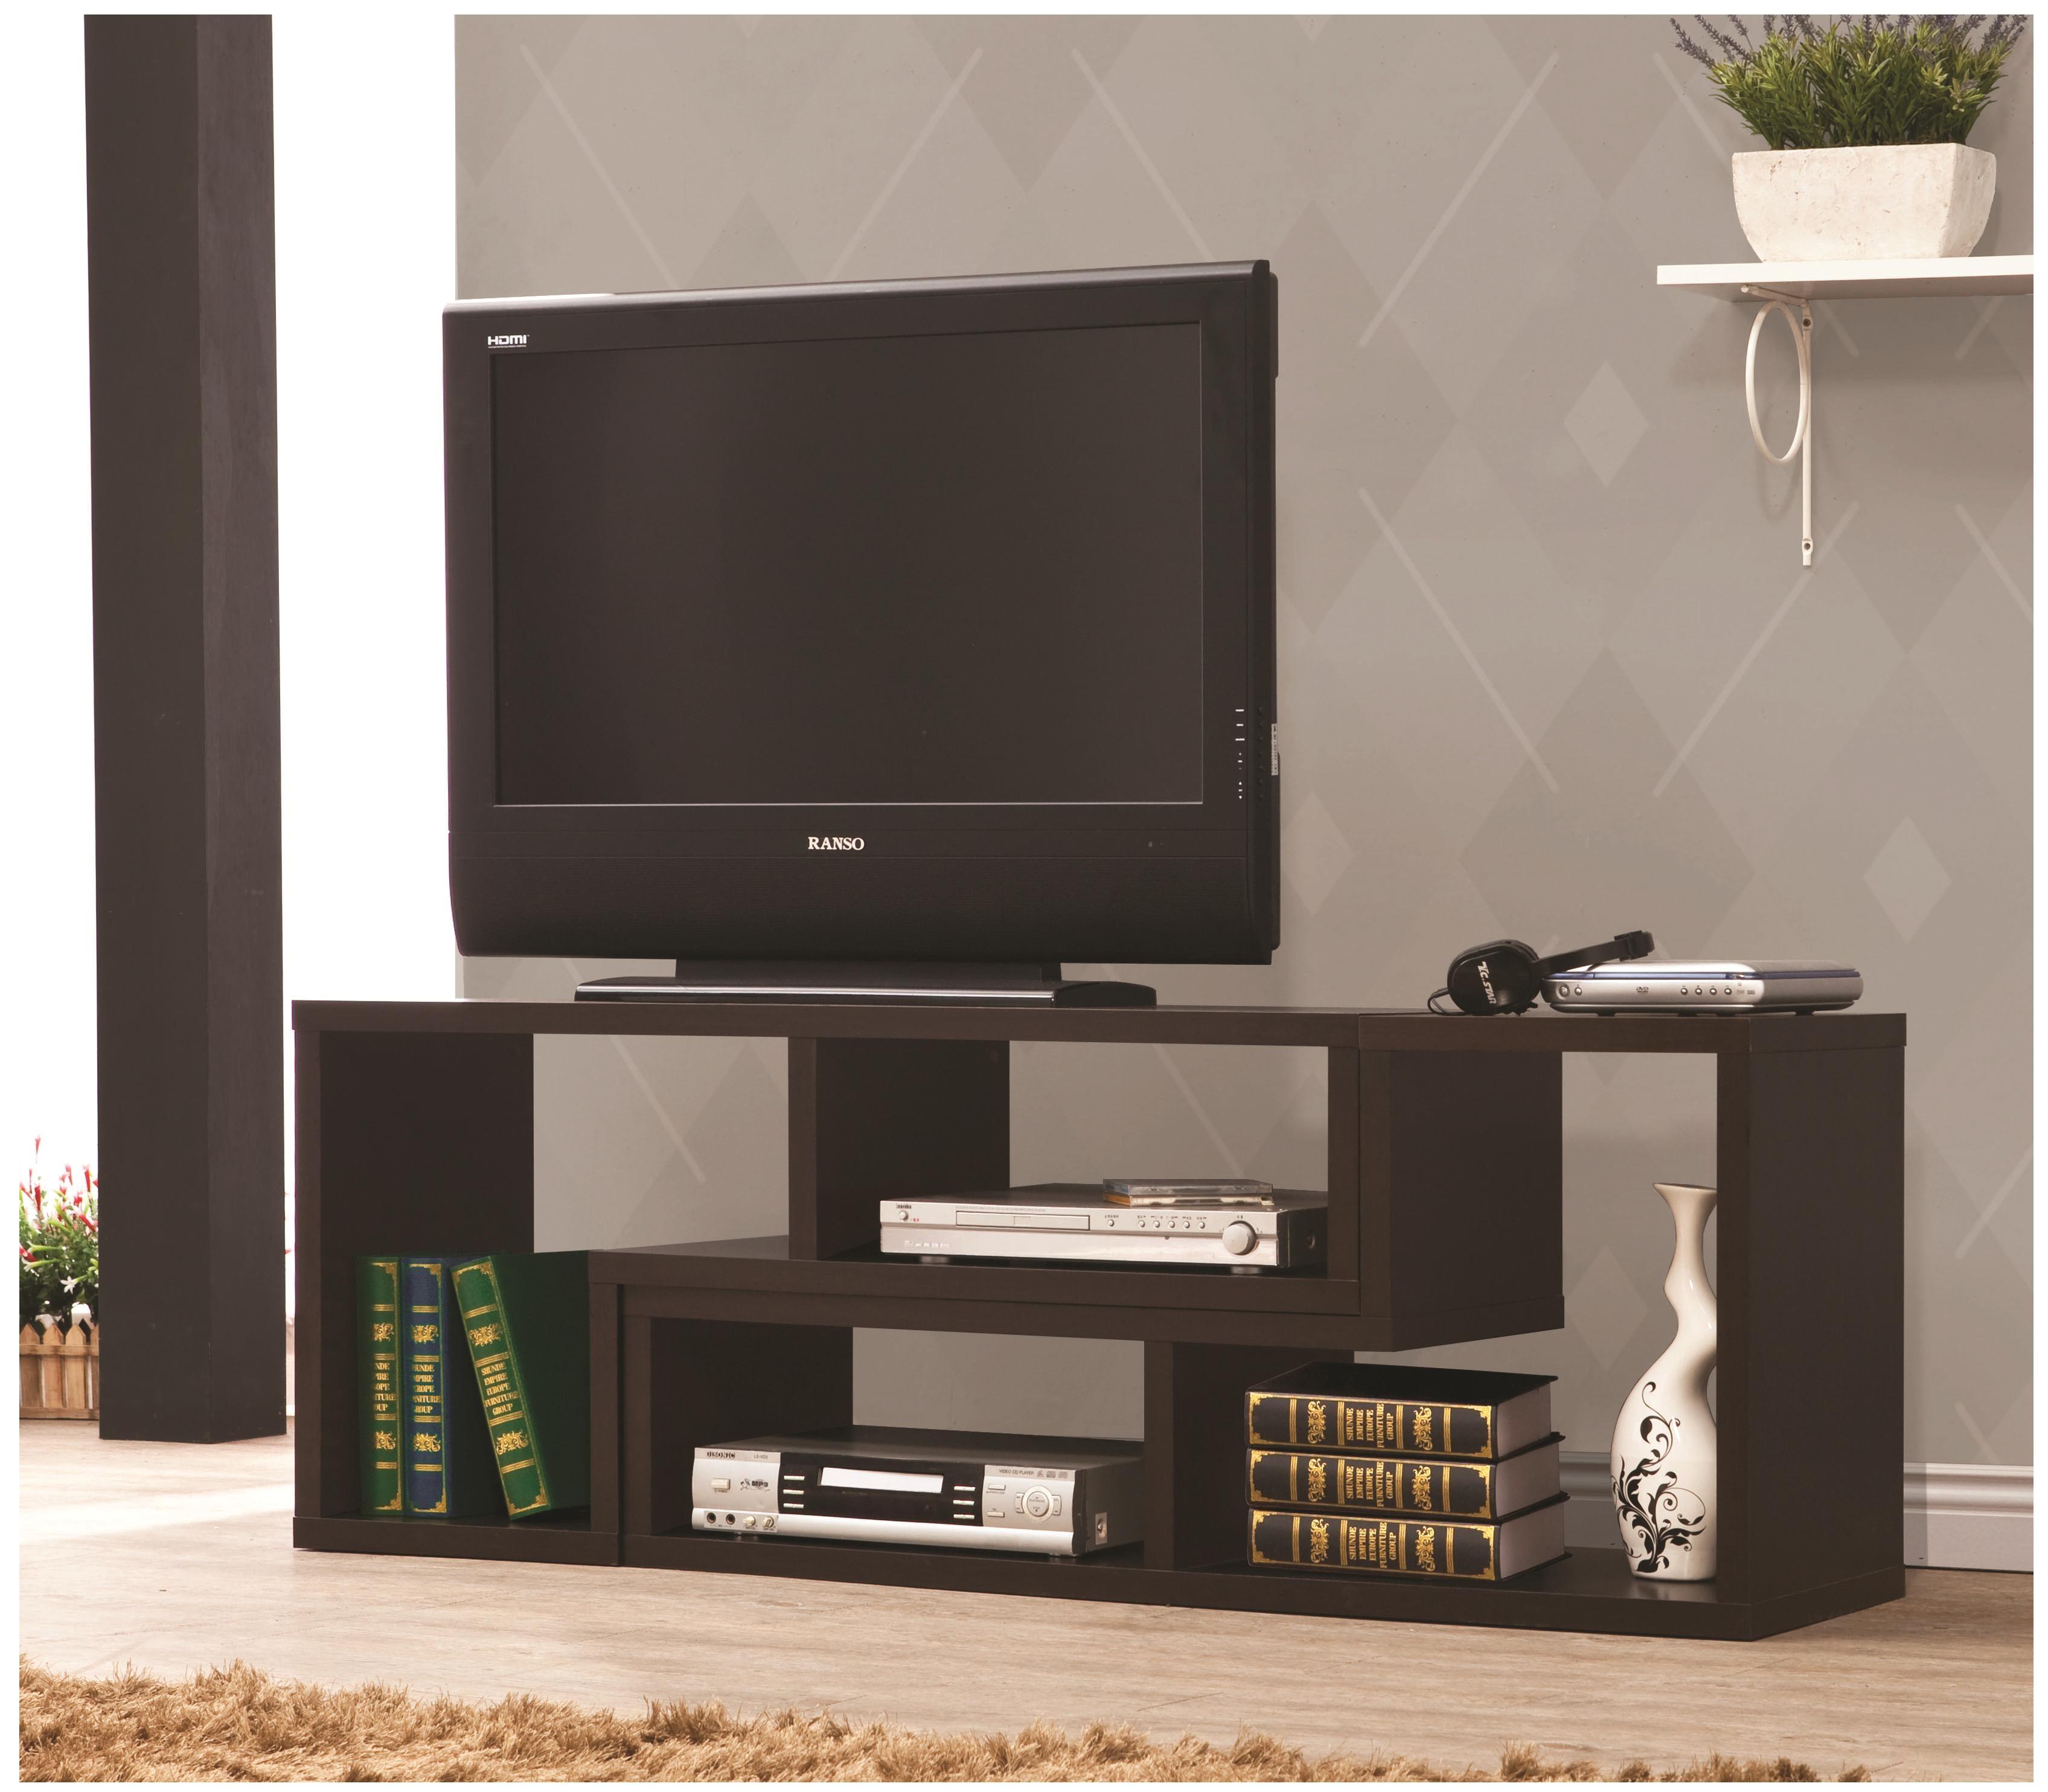 coaster tv stands convertible tv console and bookcase combination standard furniture tv stands birmingham huntsville hoover decatur alabaster